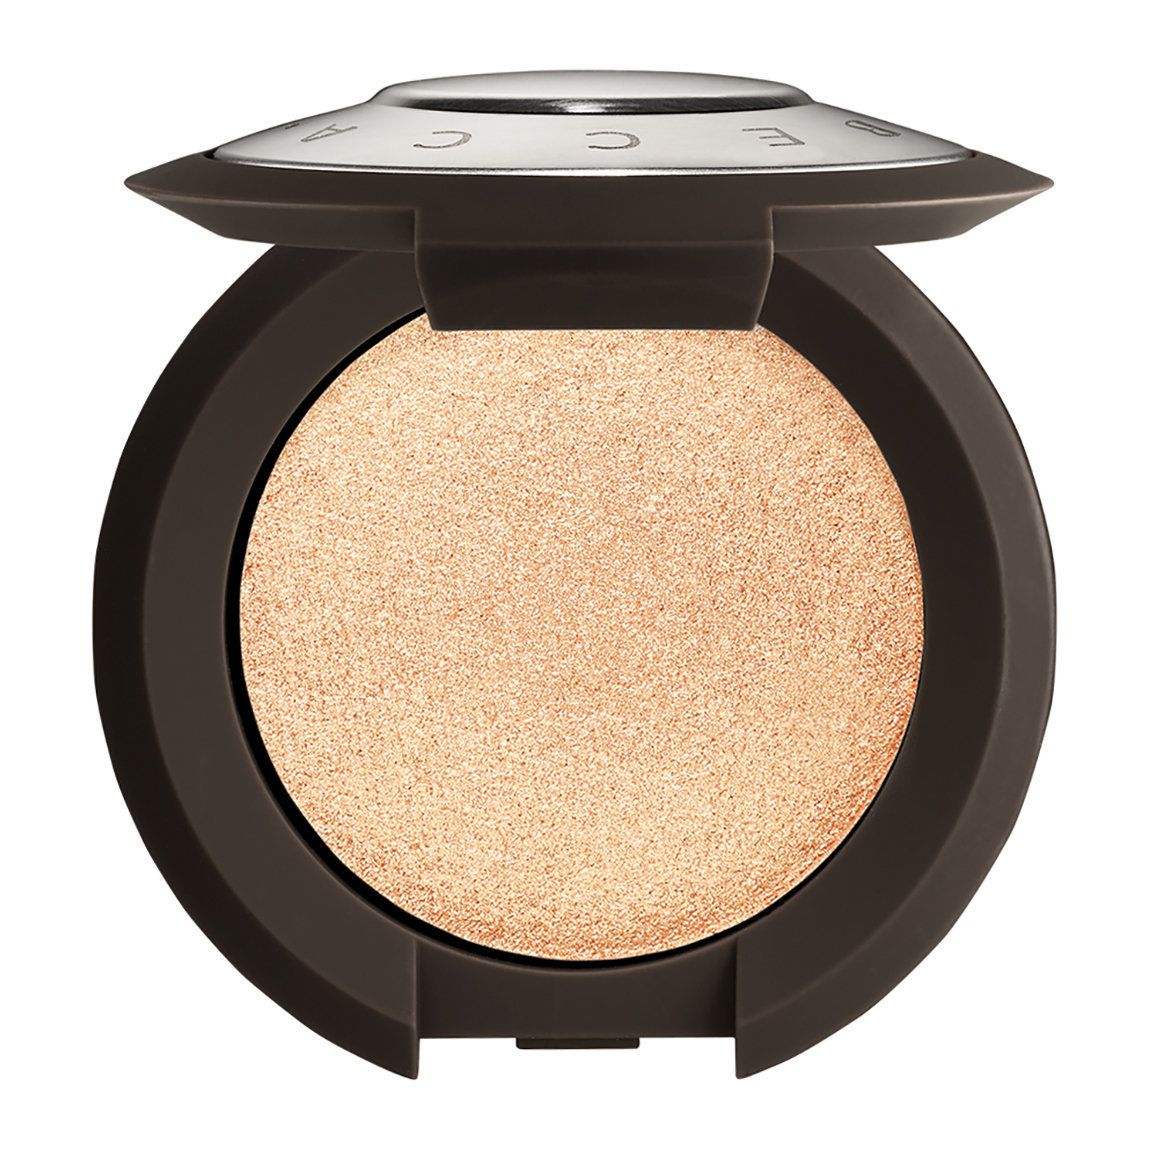 BECCA Cosmetics Mini Shimmering Skin Perfector Pressed Highlighter Moonstone alternative view 1.